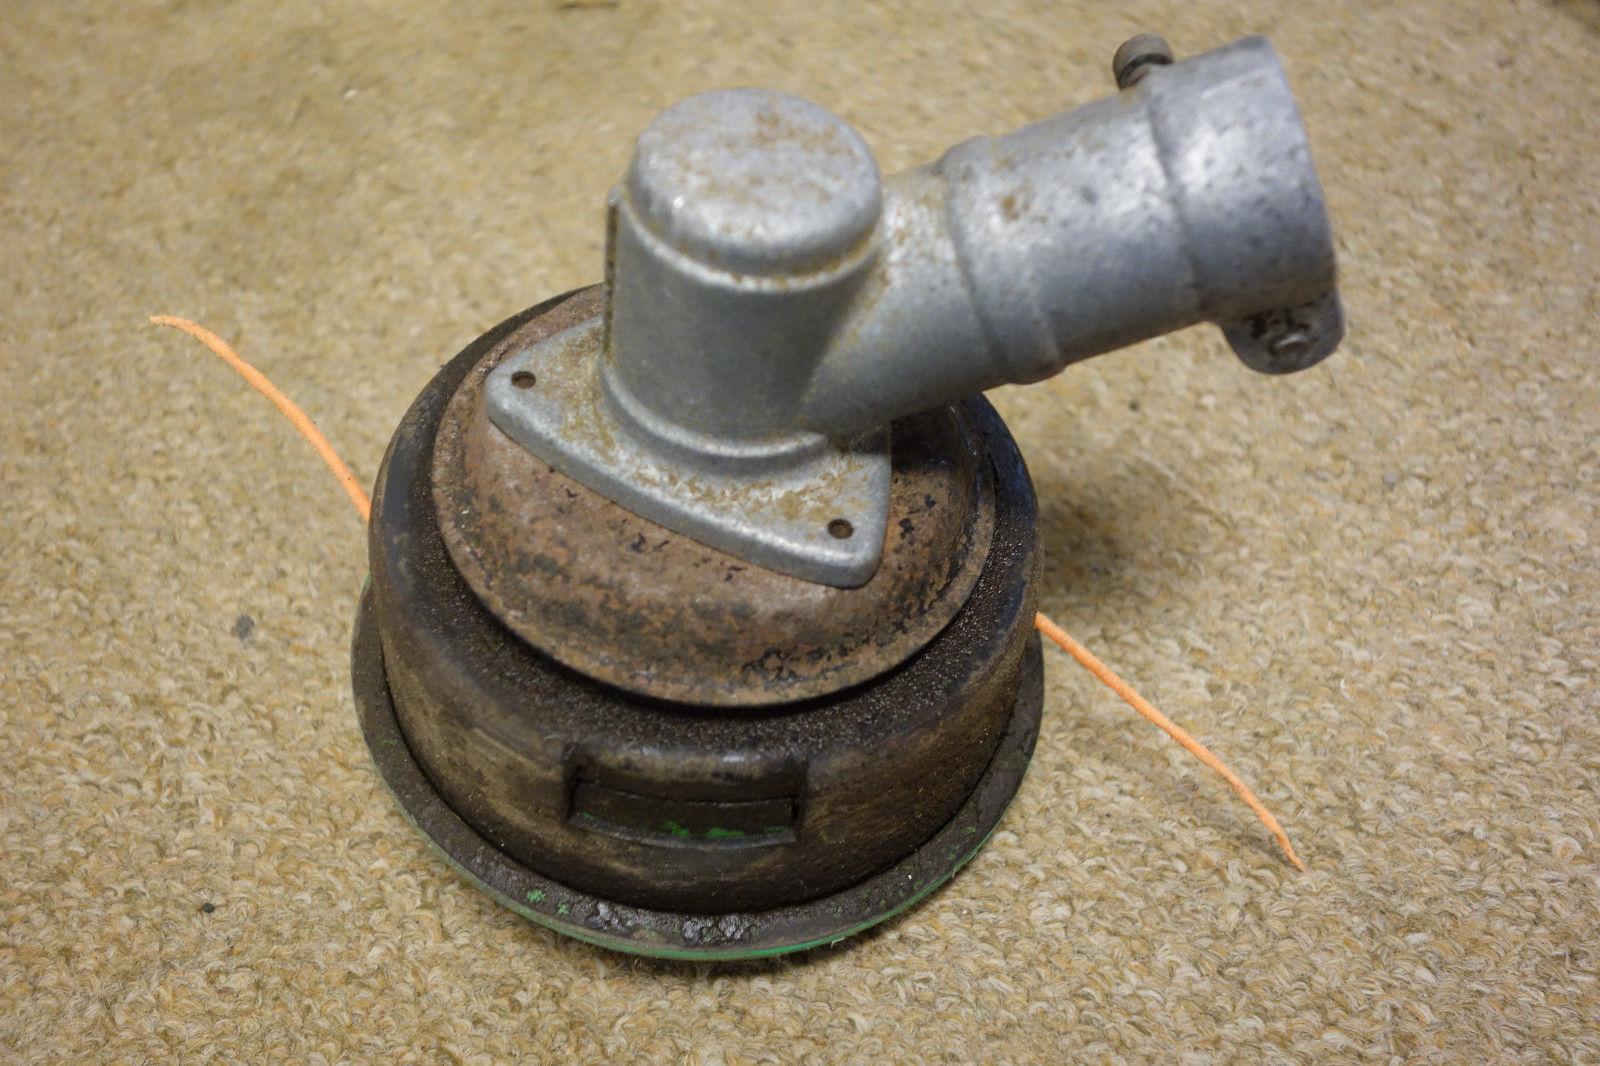 Oem John Deere Trimmer // Ignition Coil Assembly // Part ...